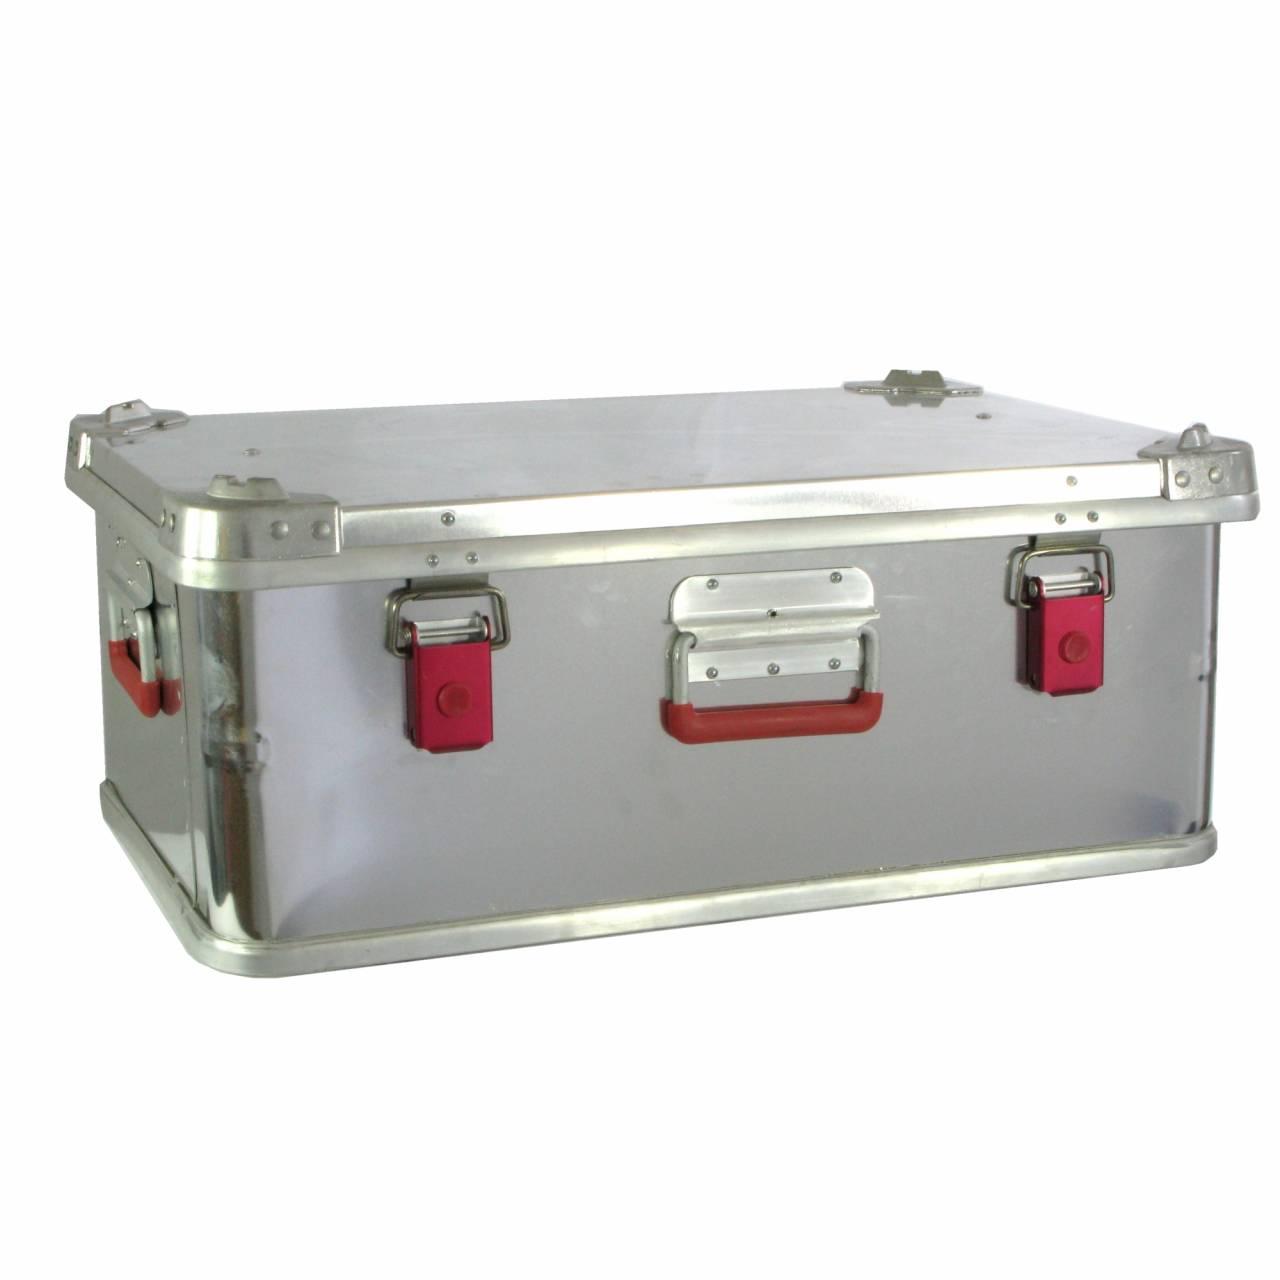 Alu-Werkzeugbox Gr.3, 690 x 490 x 330 mm